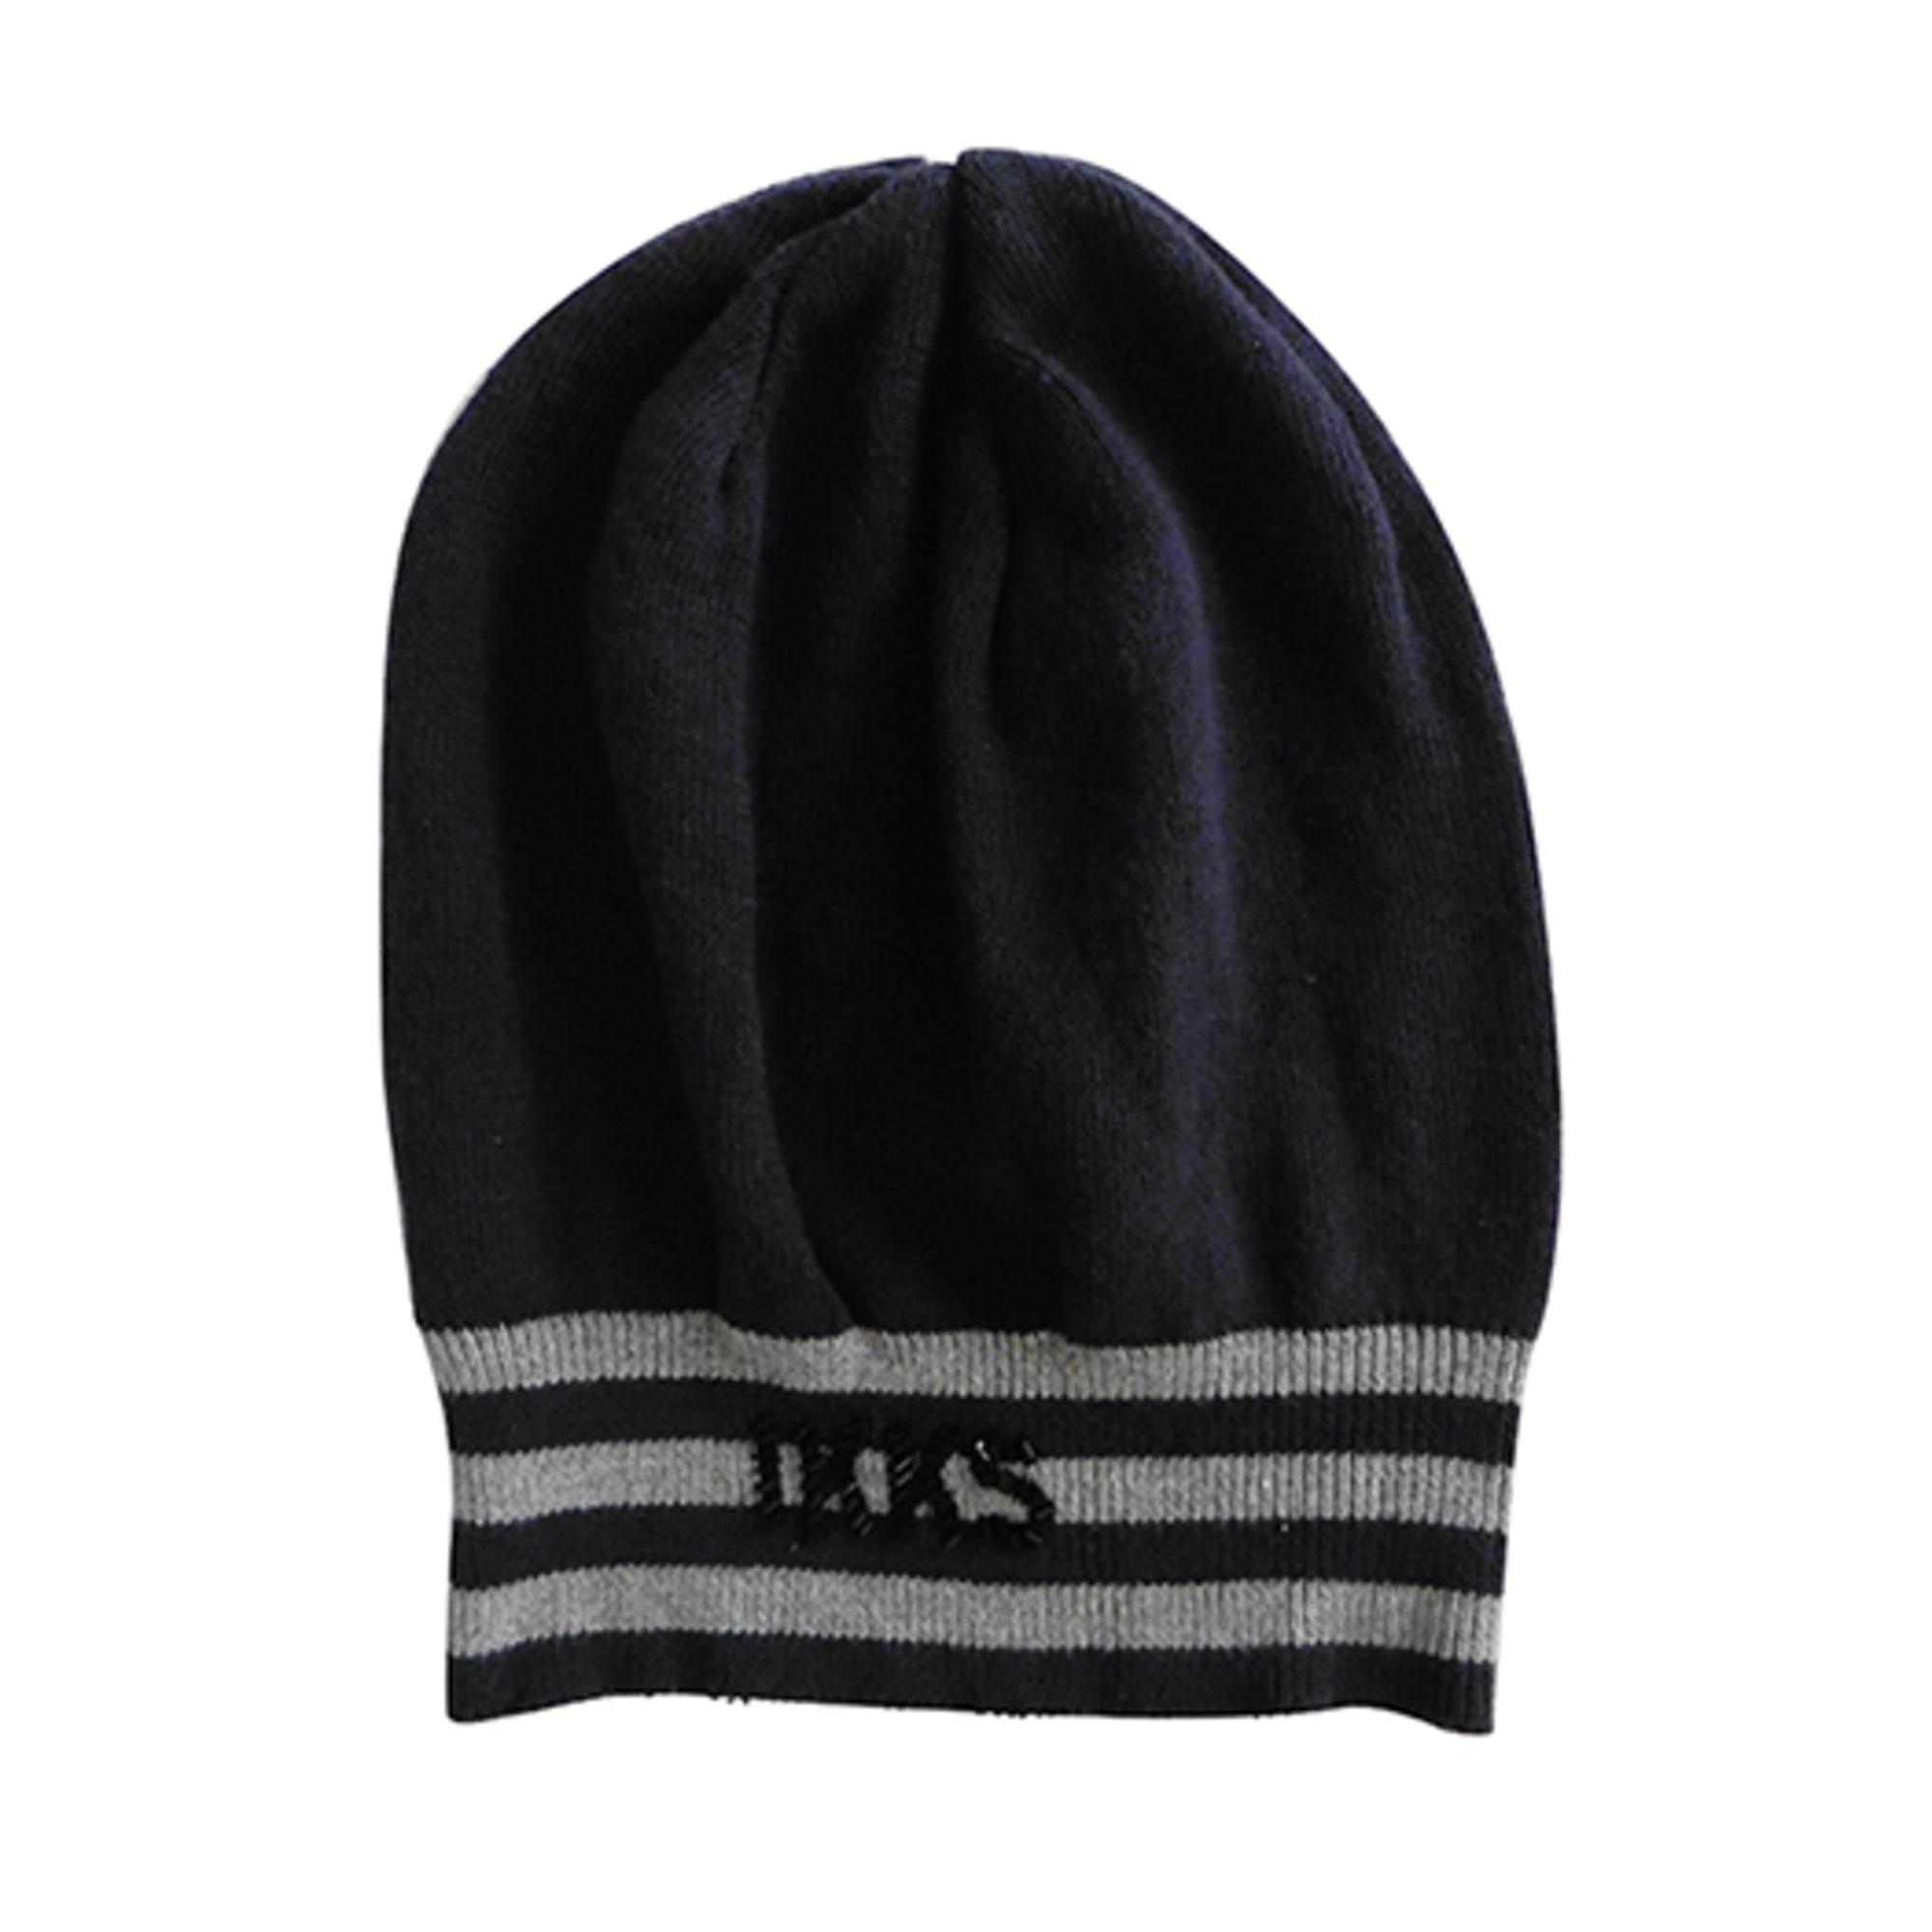 Mütze IKKS Grau, anthrazit